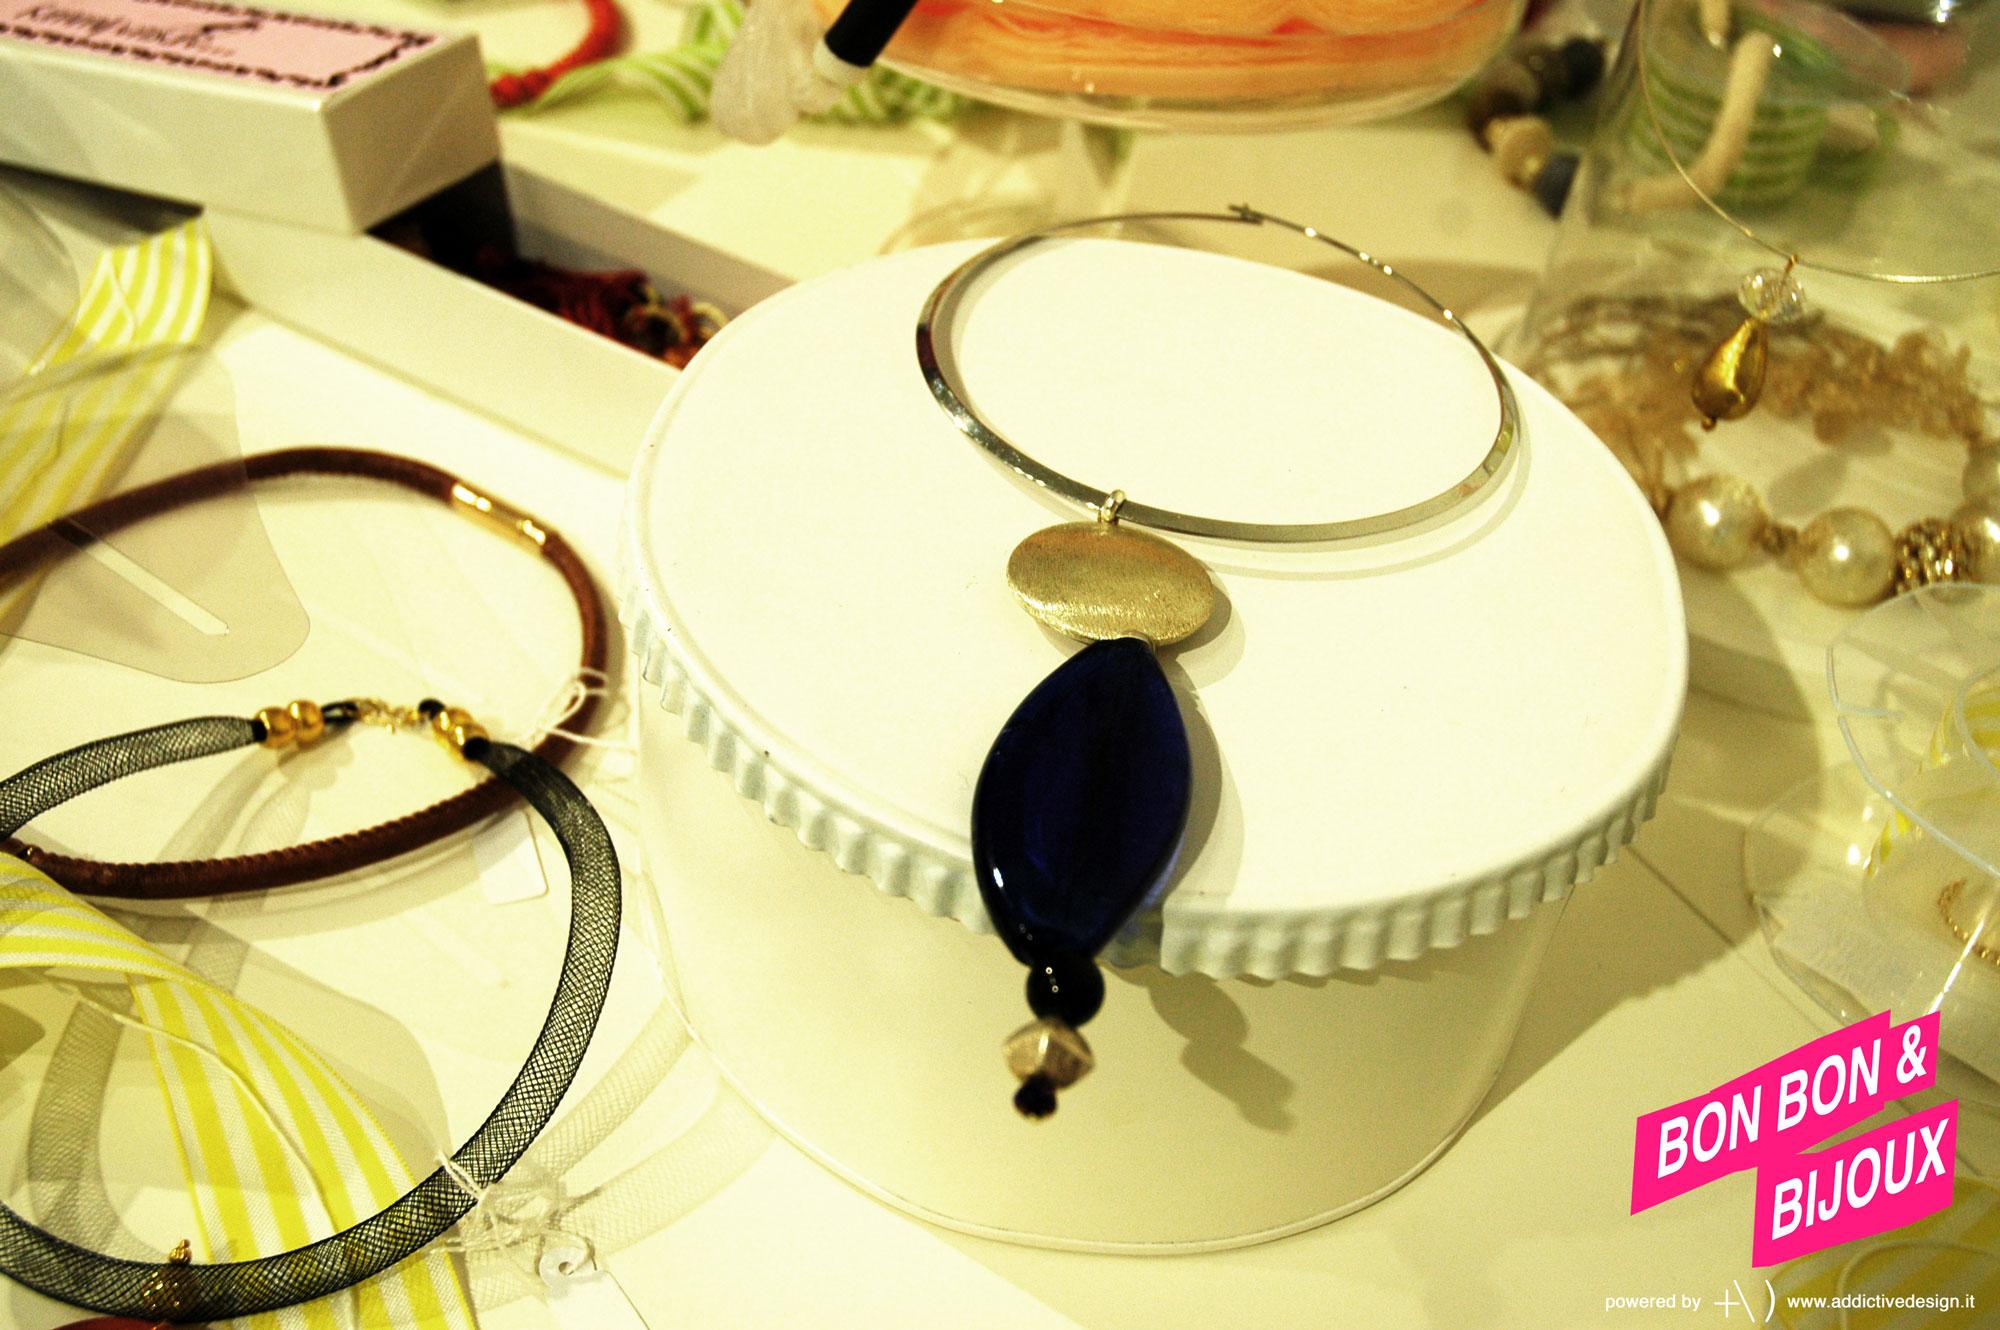 bonbon & bijoux collane